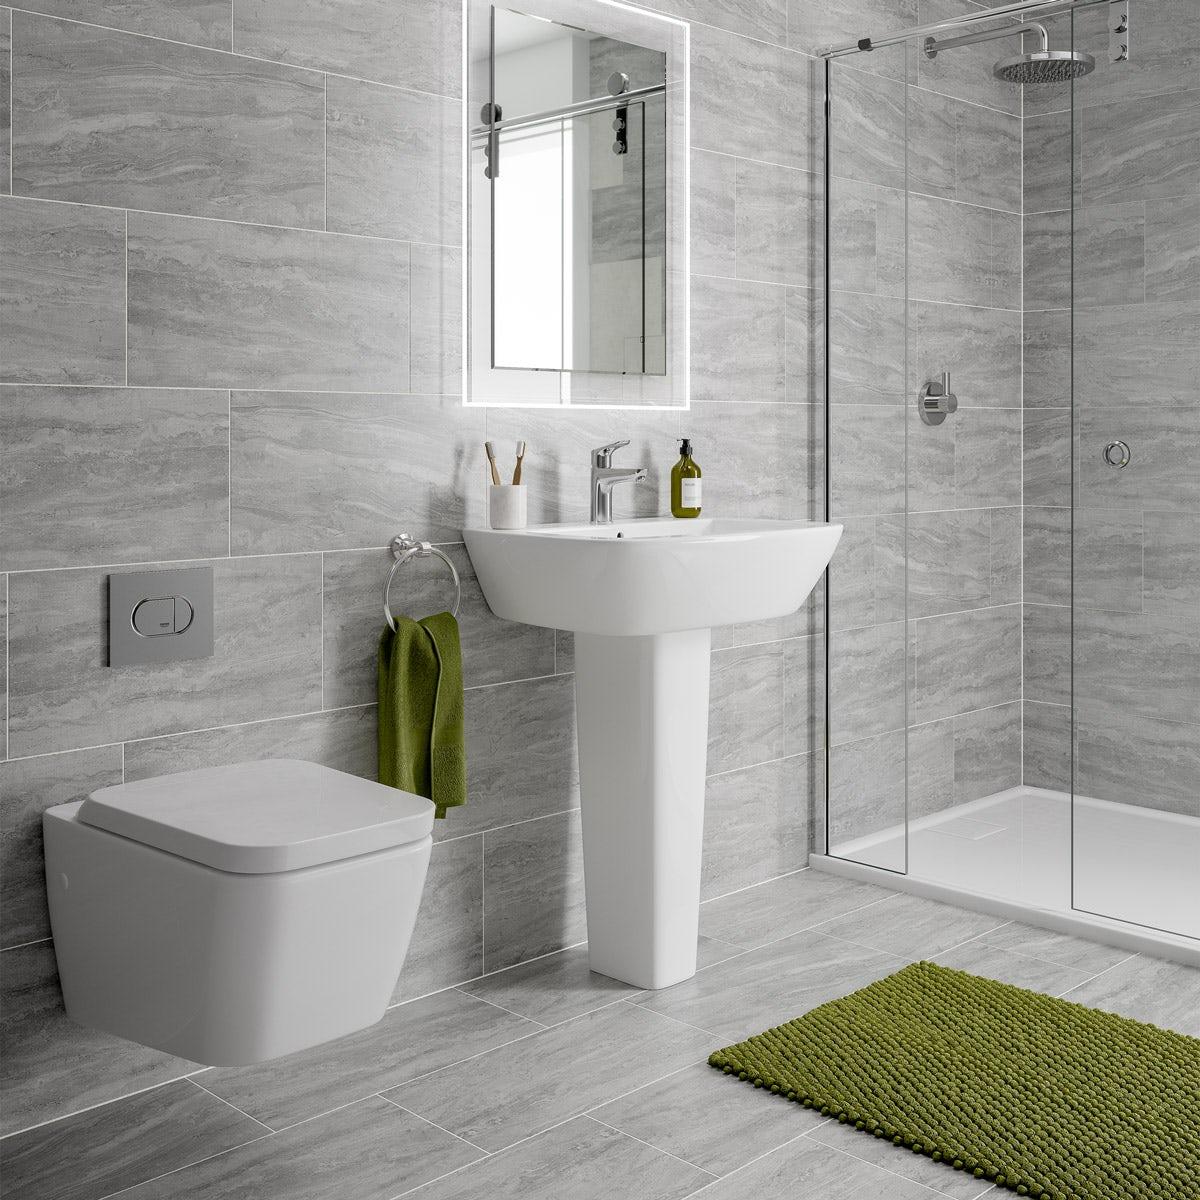 Floor Tiles Bathroom Grey Image Of